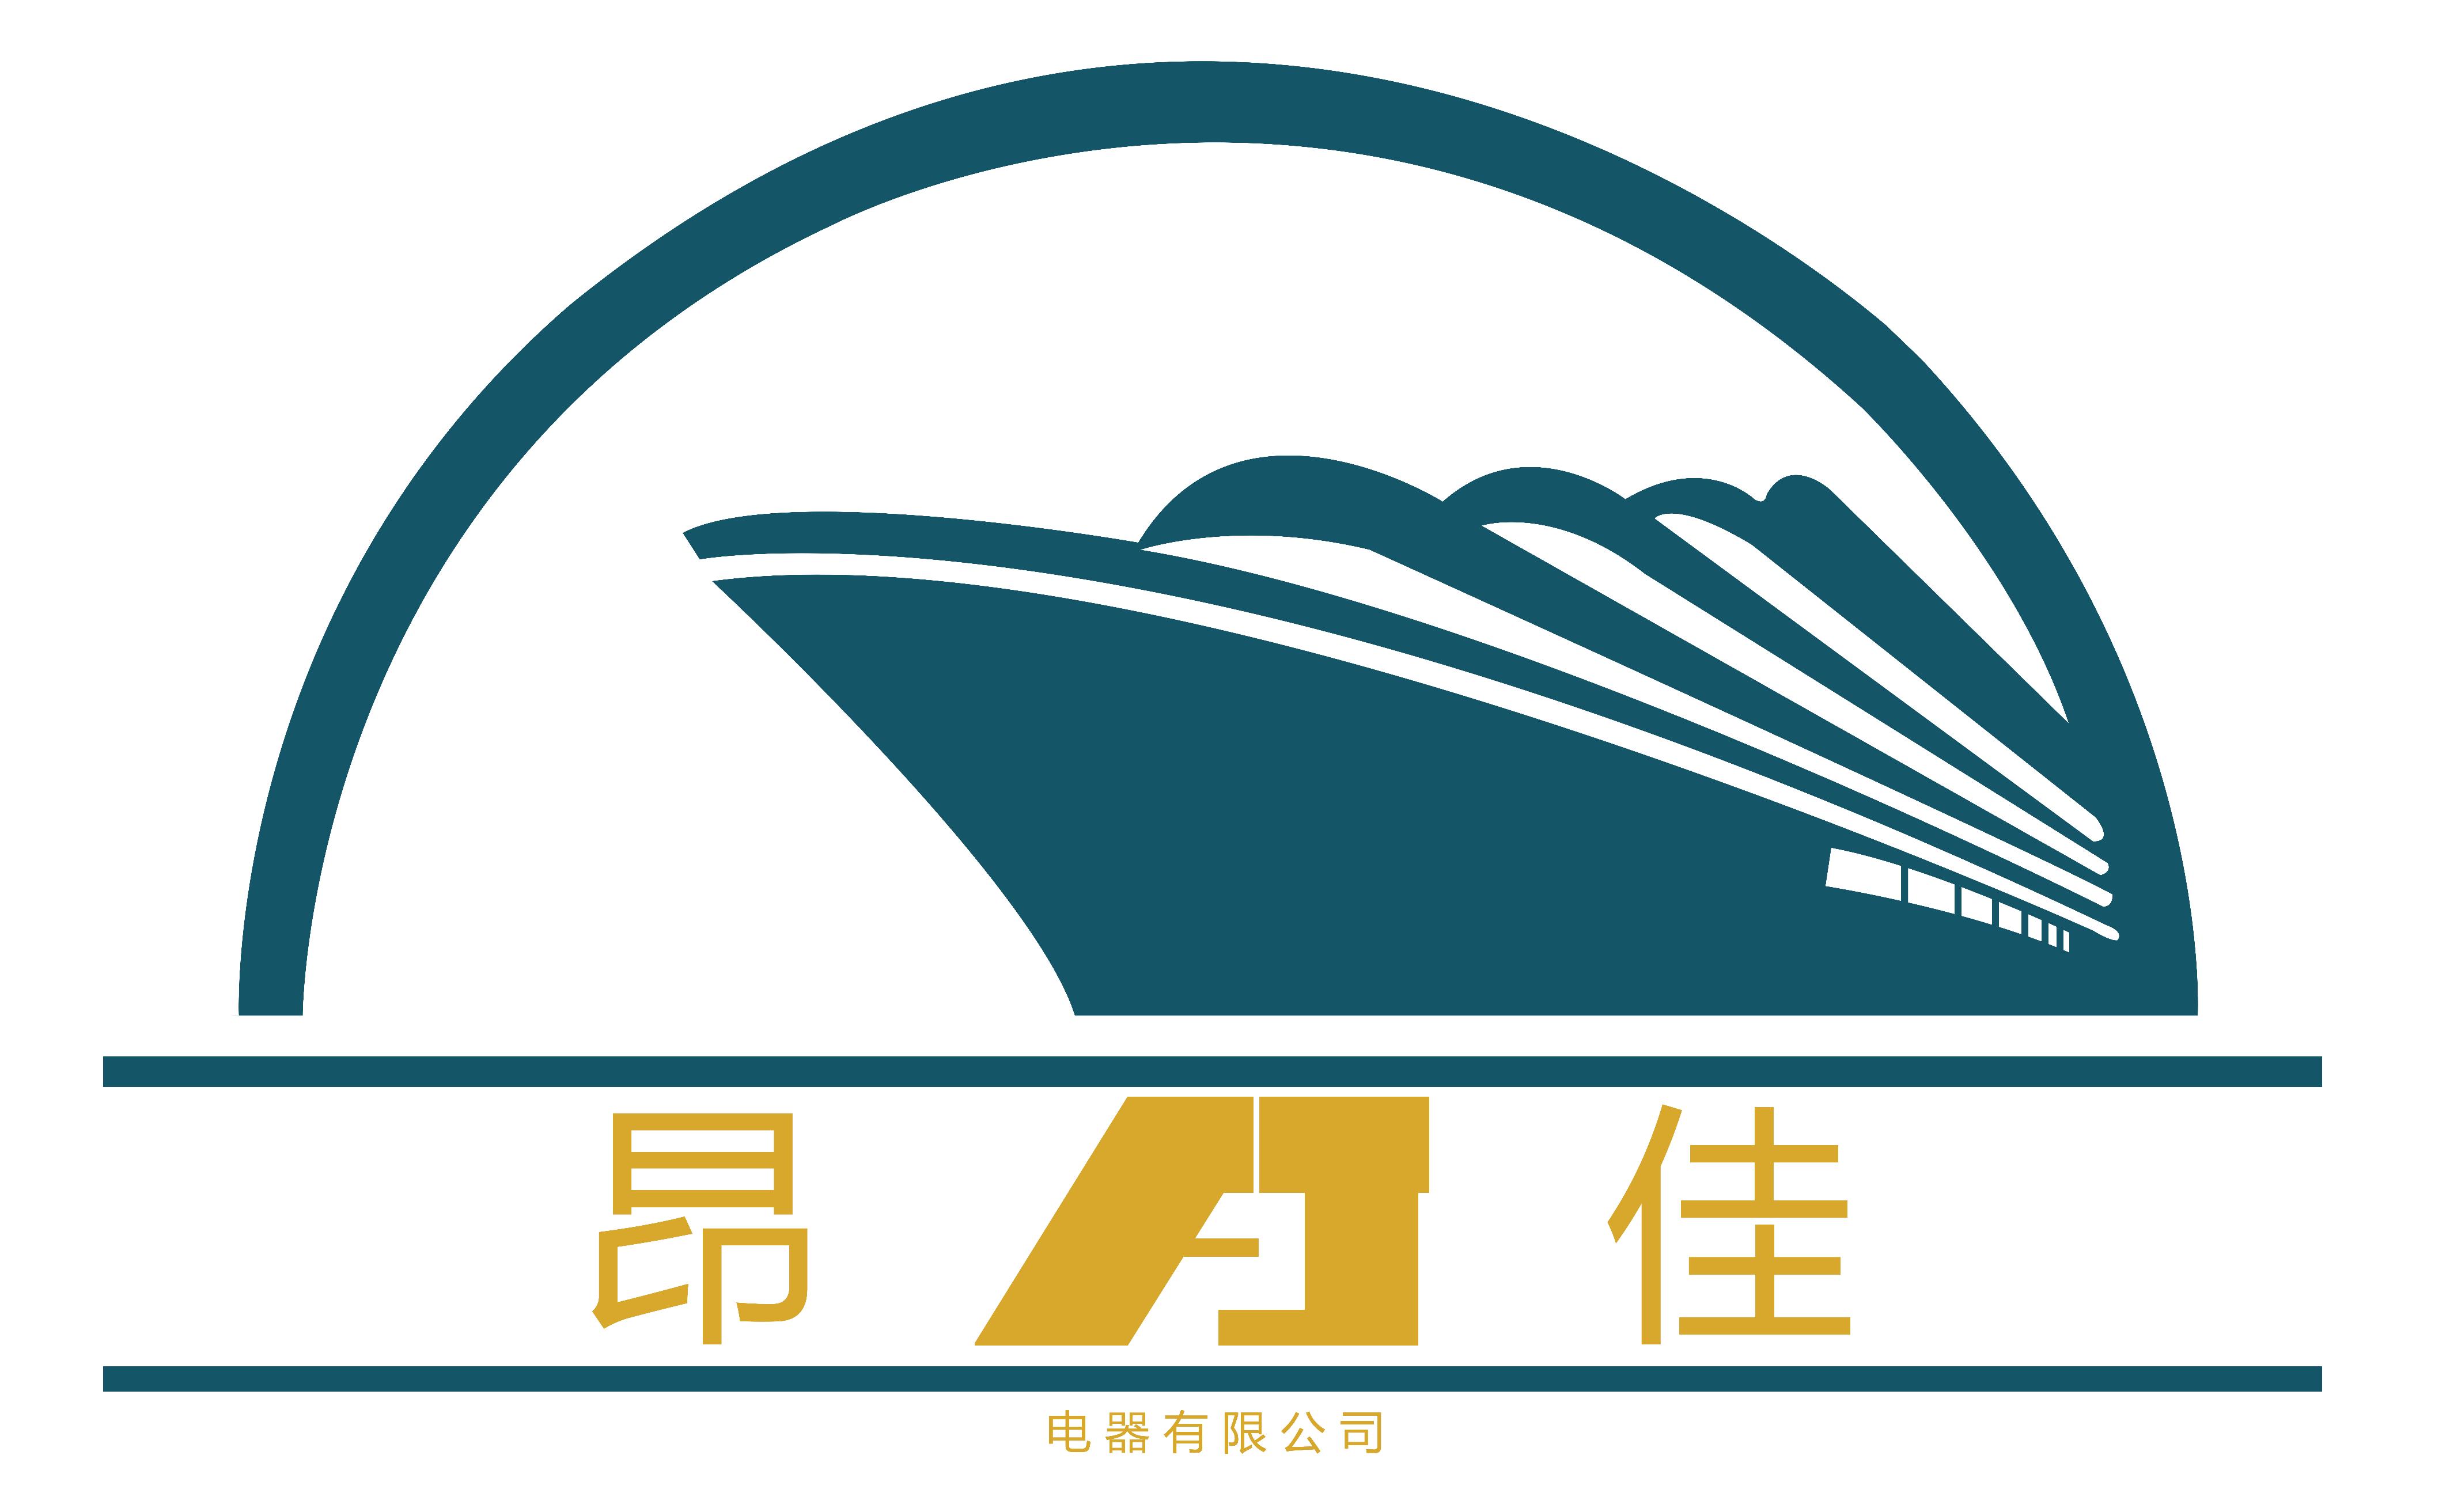 昂佳logo1